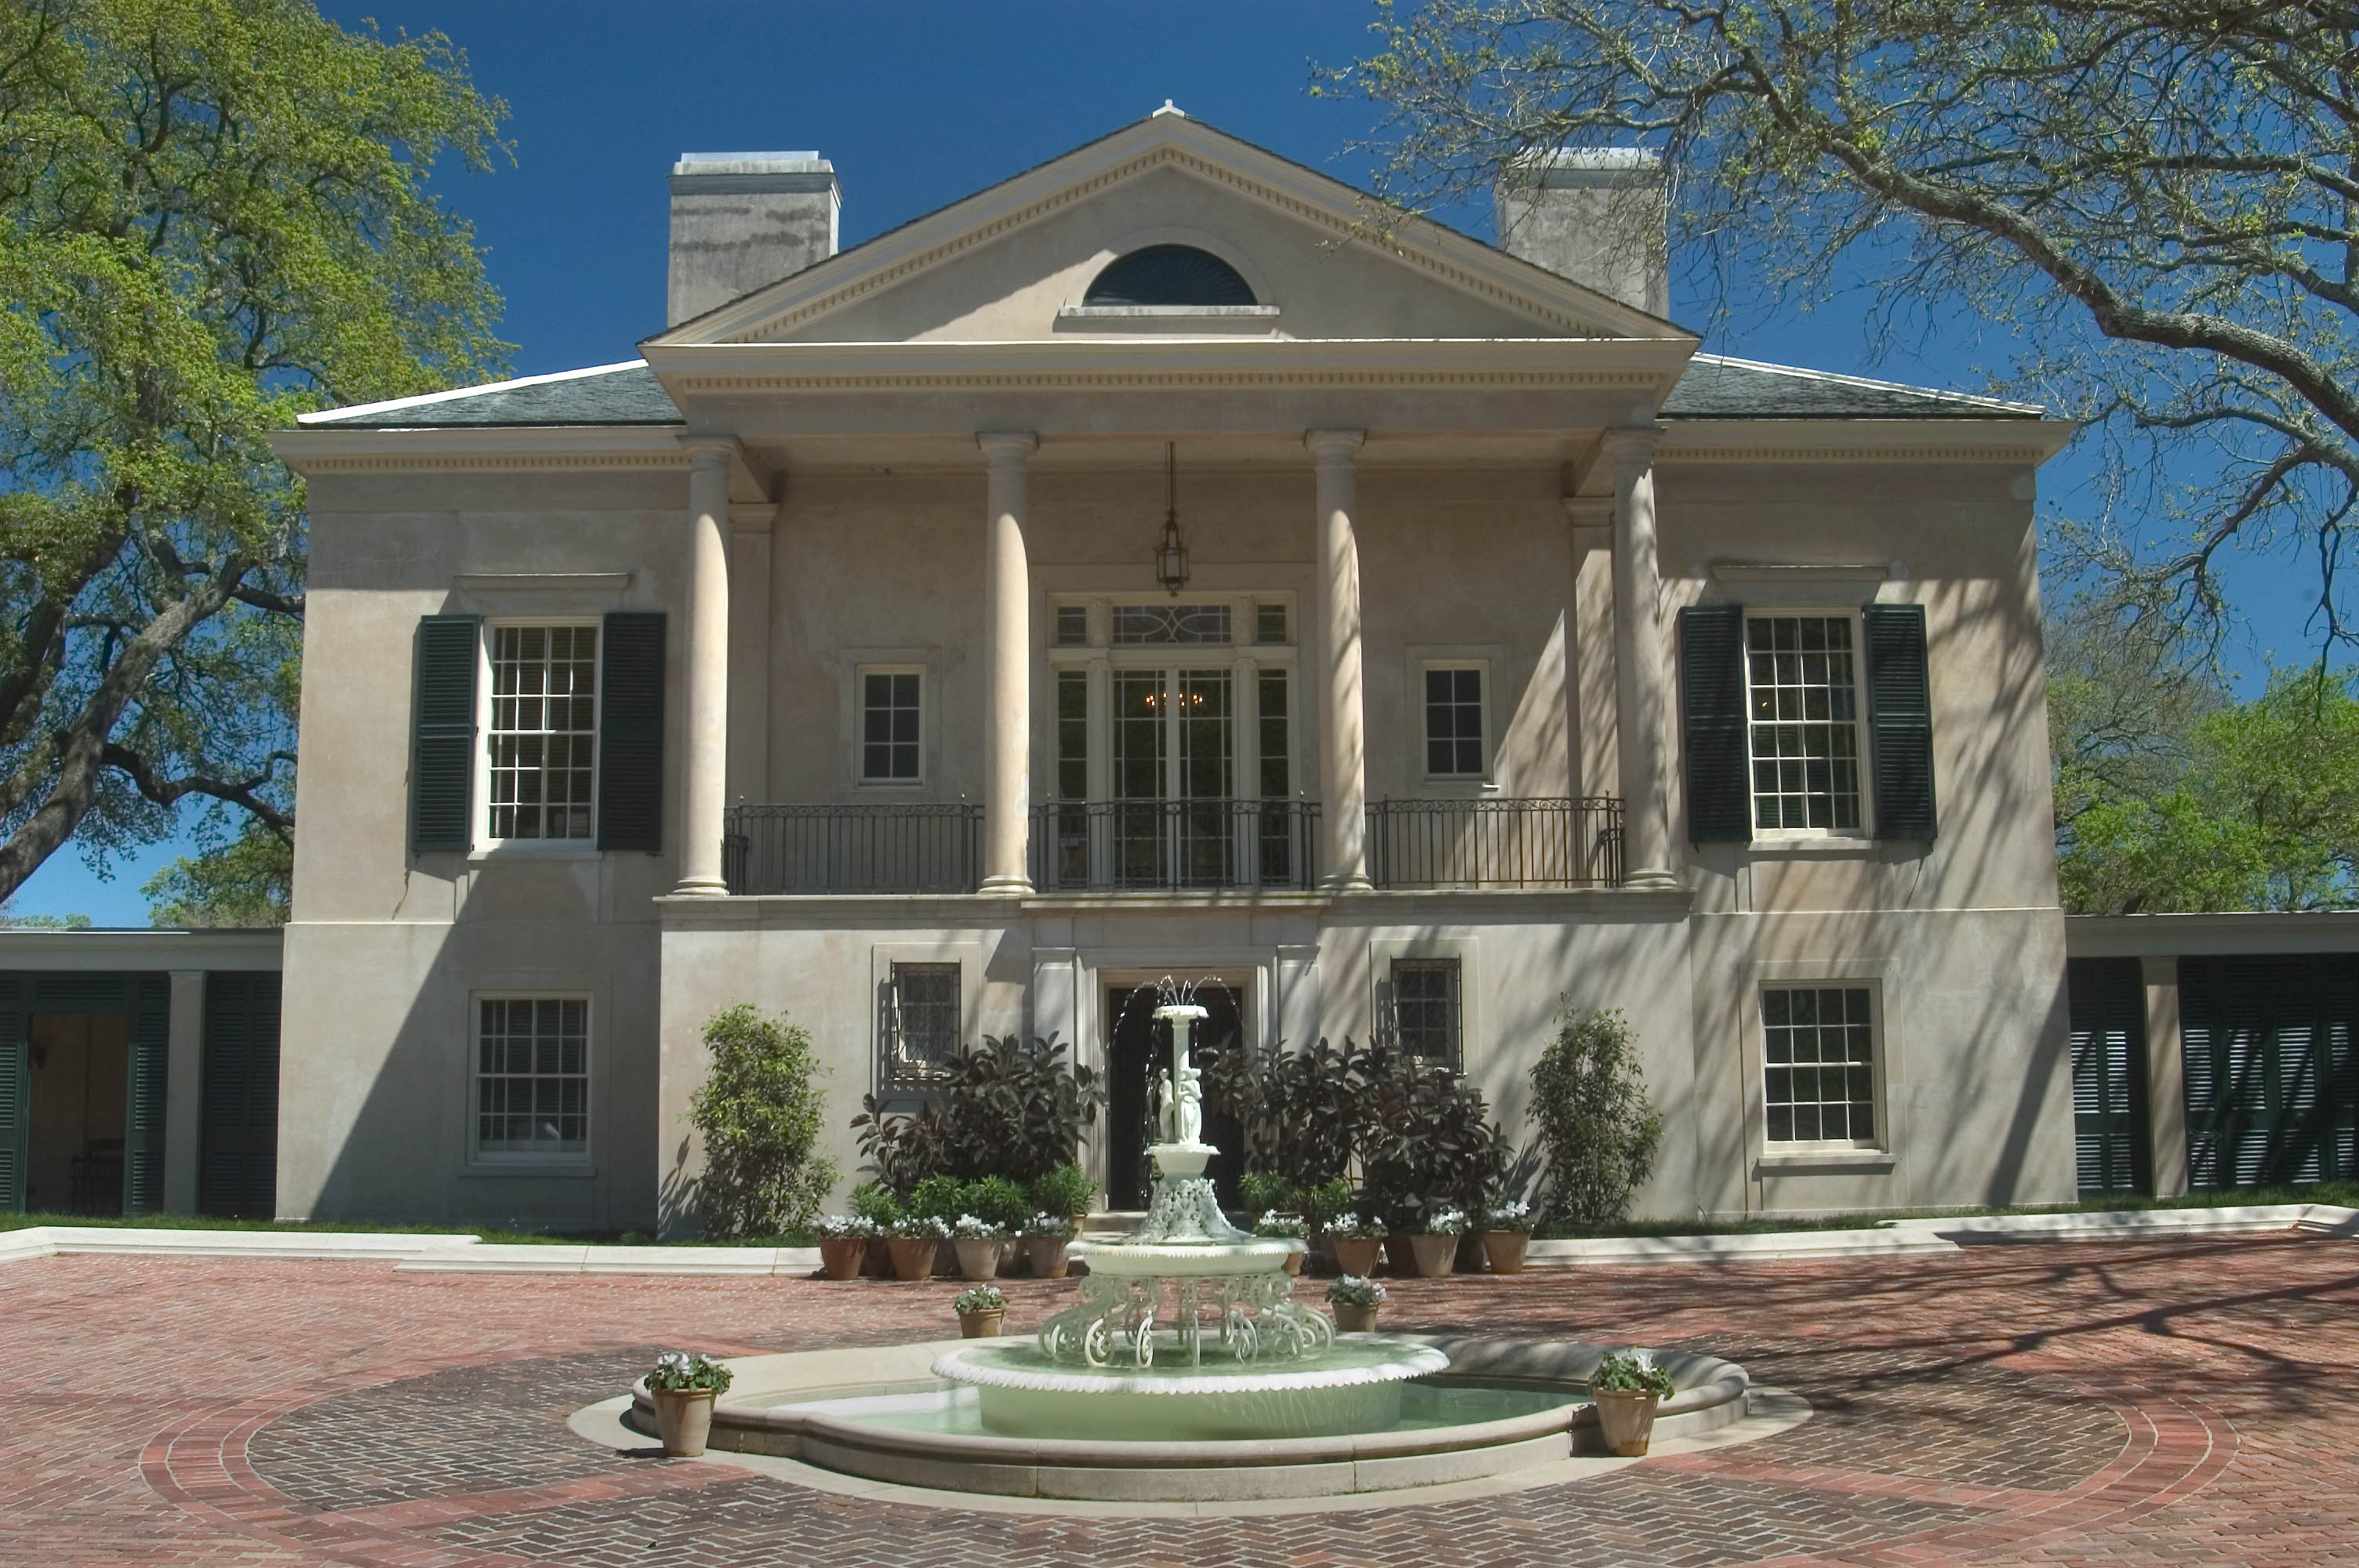 Forecourt Of Longue Vue House New Orleans Louisiana April